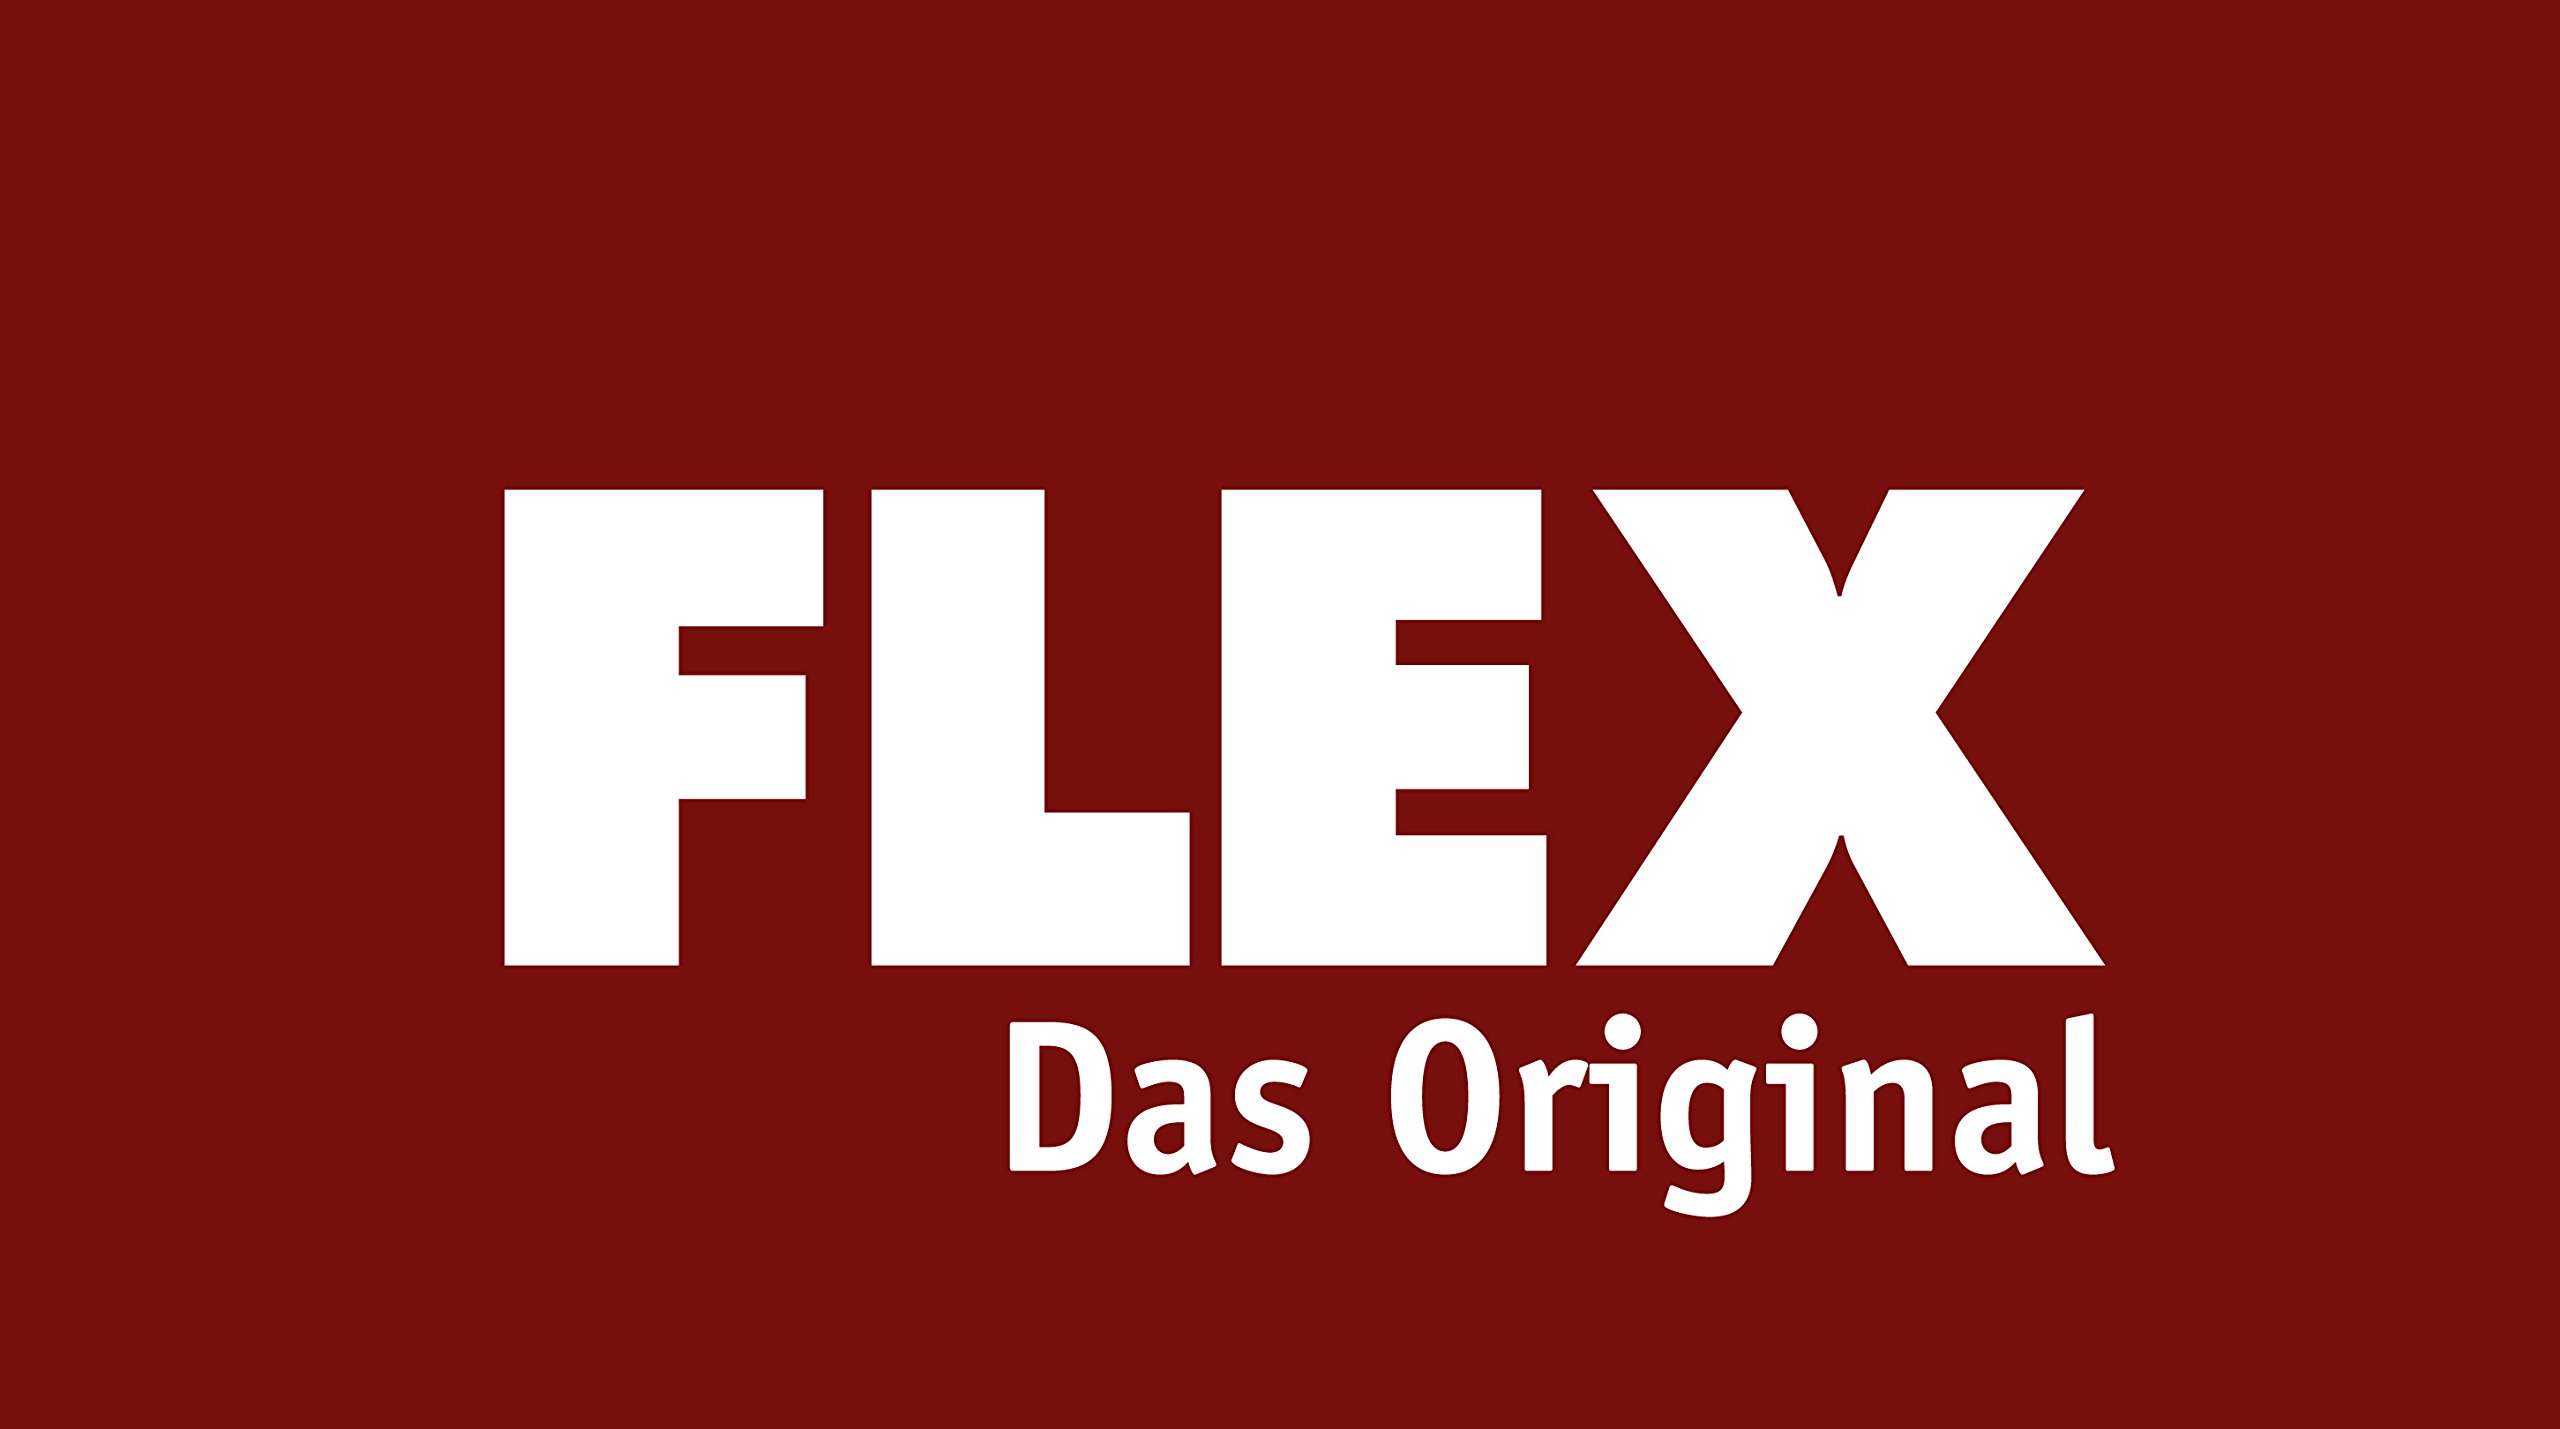 Flex XC3401VRG Positive-Drive Rotary-Orbital Polisher